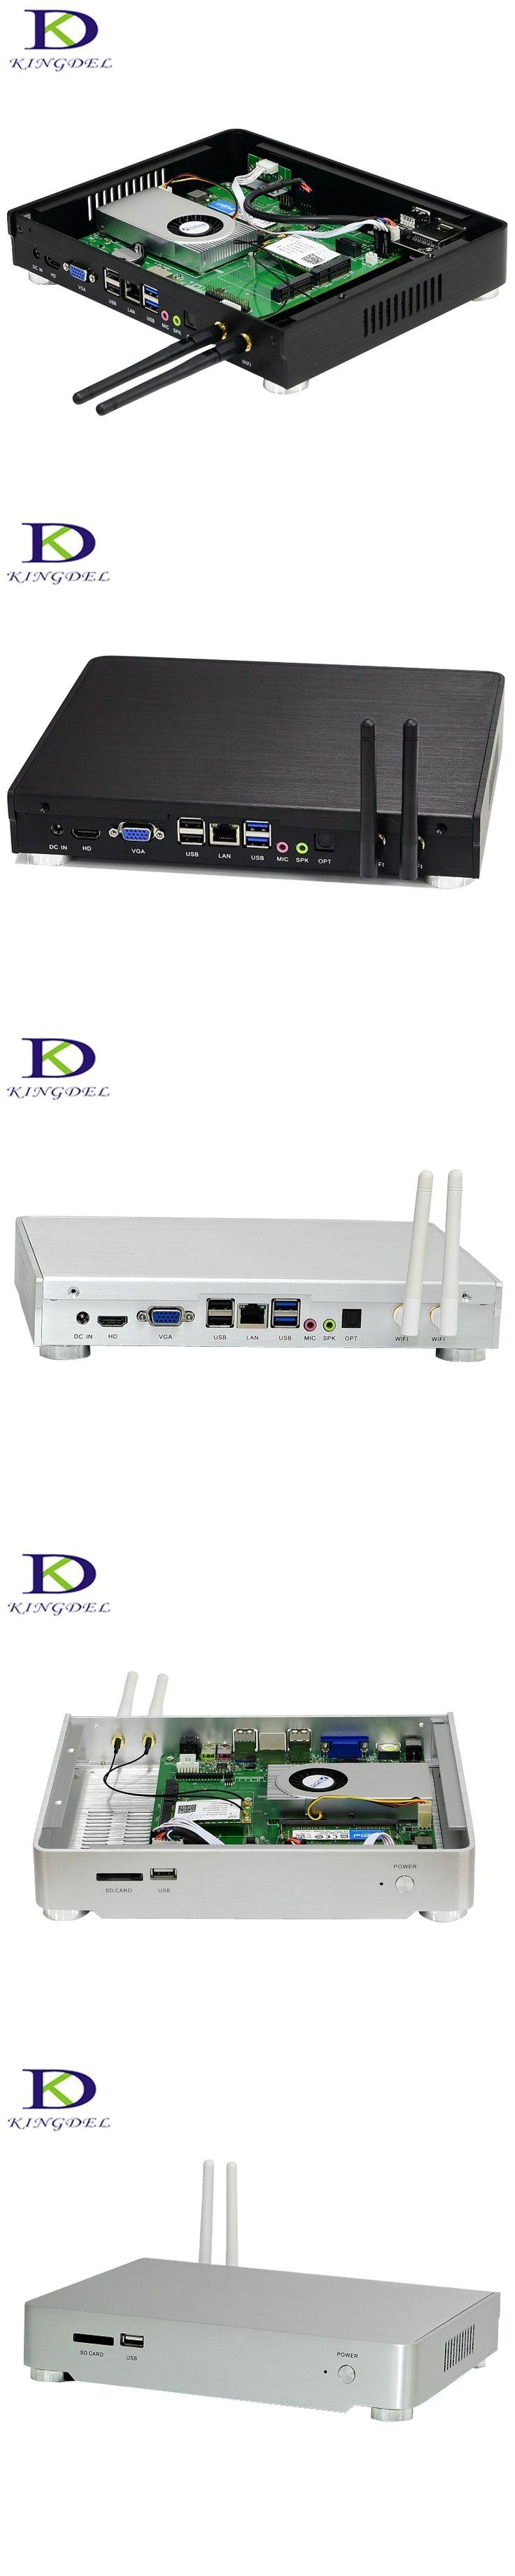 Delicate Tiny computer TV box Win10 Mini PC  i5 4260U Dual Core, LAN  1.4GHz  wifi ,HDMI ,VGA, SD Card ,USB Blanck/silver NC600